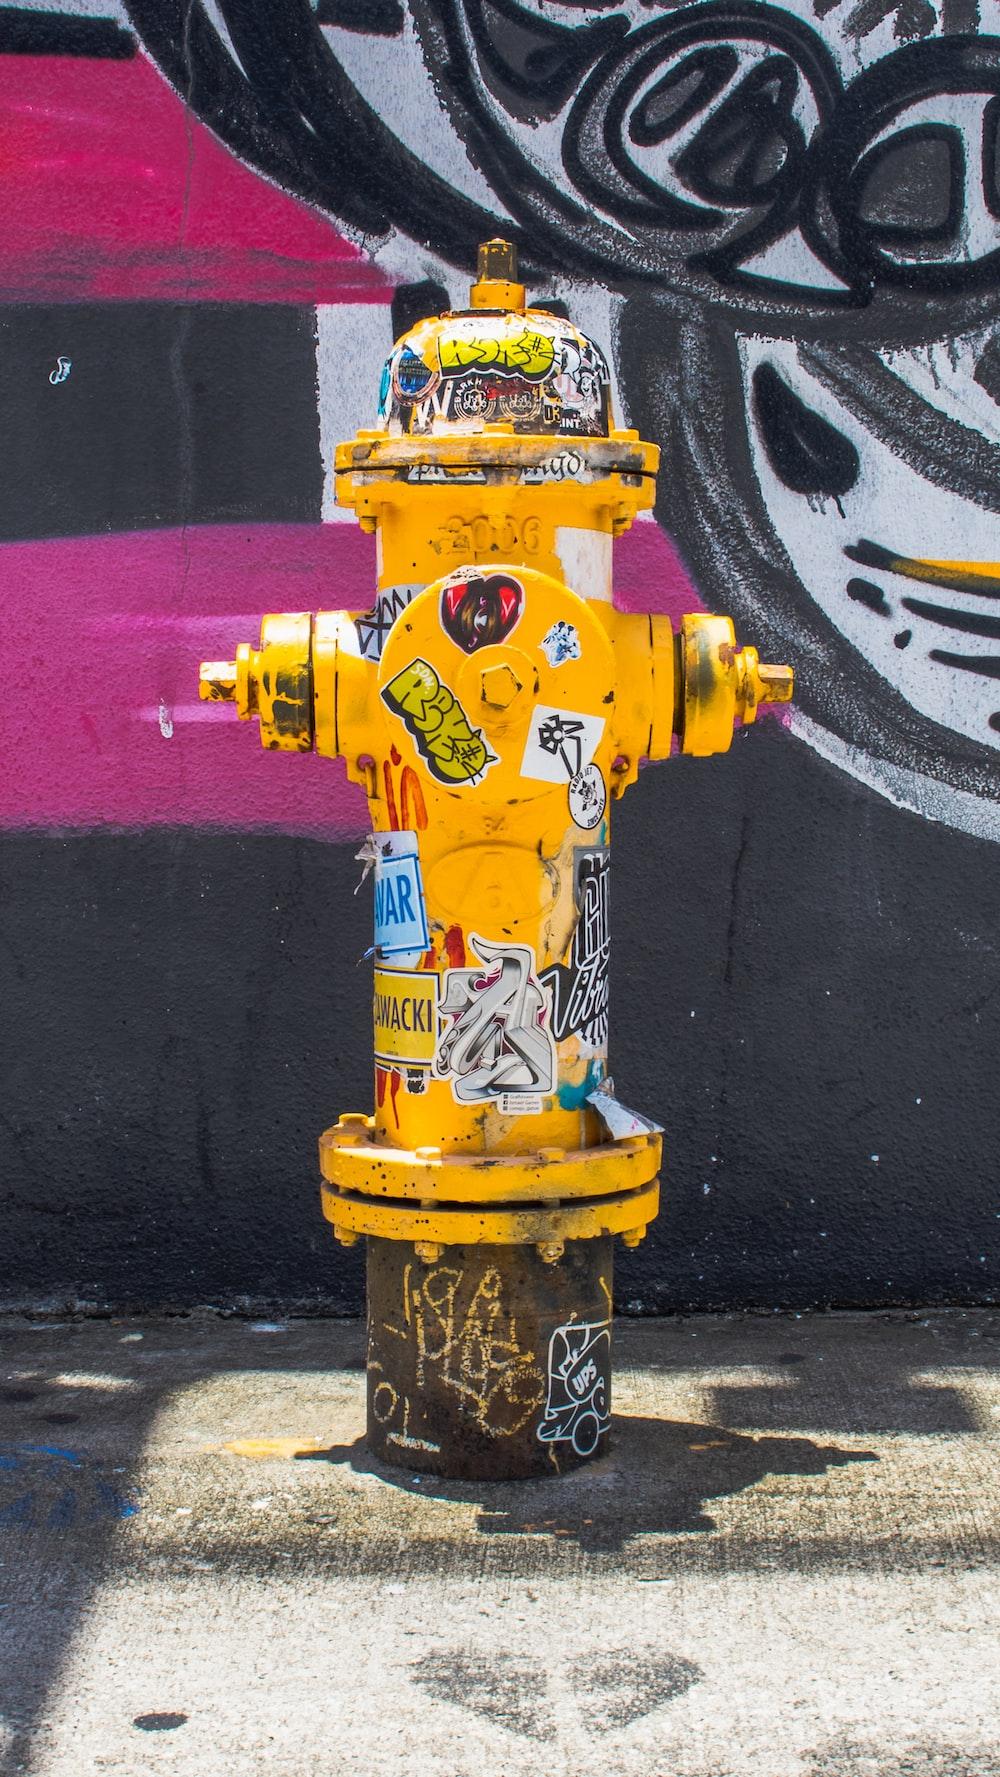 yellow fire hydrant near wall